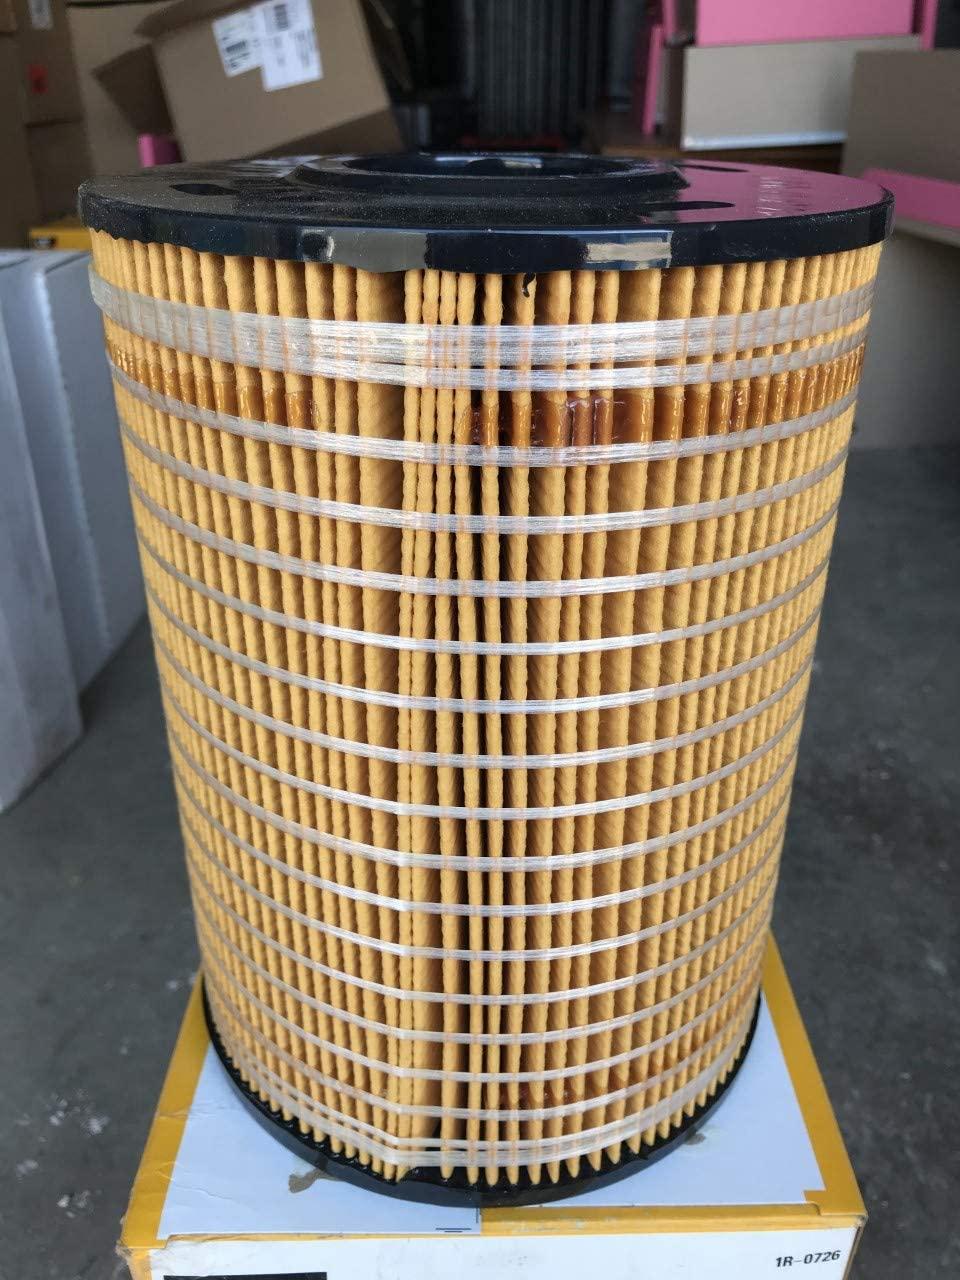 1R-0726 - CAT Engine Oil Filter